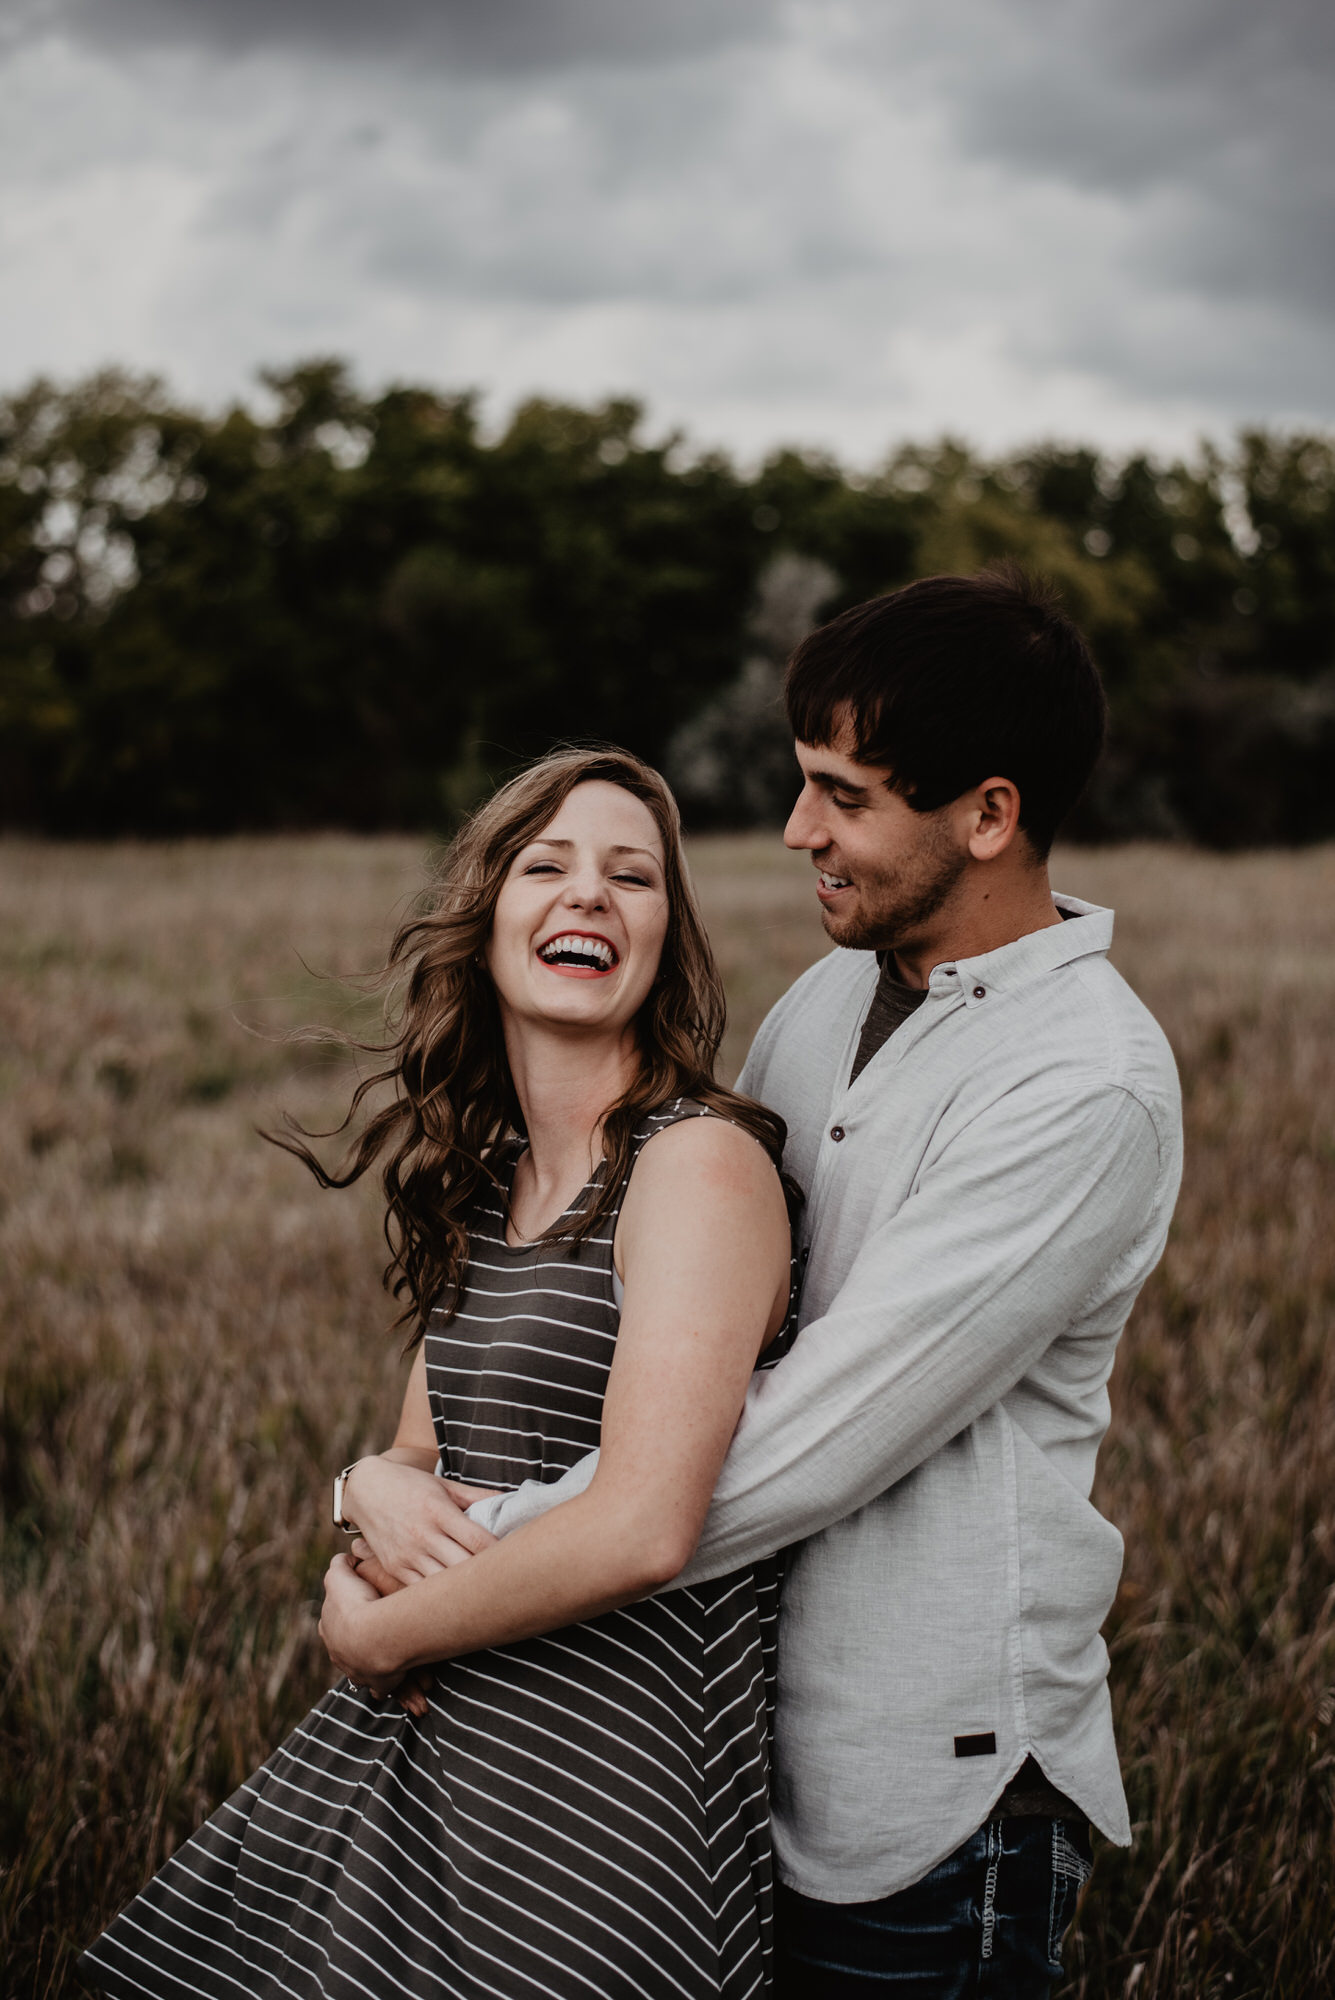 Kaylie-Sirek-Photography-wedding-engagement-photographer-Grand-Island-Kearney-Hastings-Lincoln-Nebraska-central-midwest-moments-trump-posing-natural-light-engaged-06.jpg